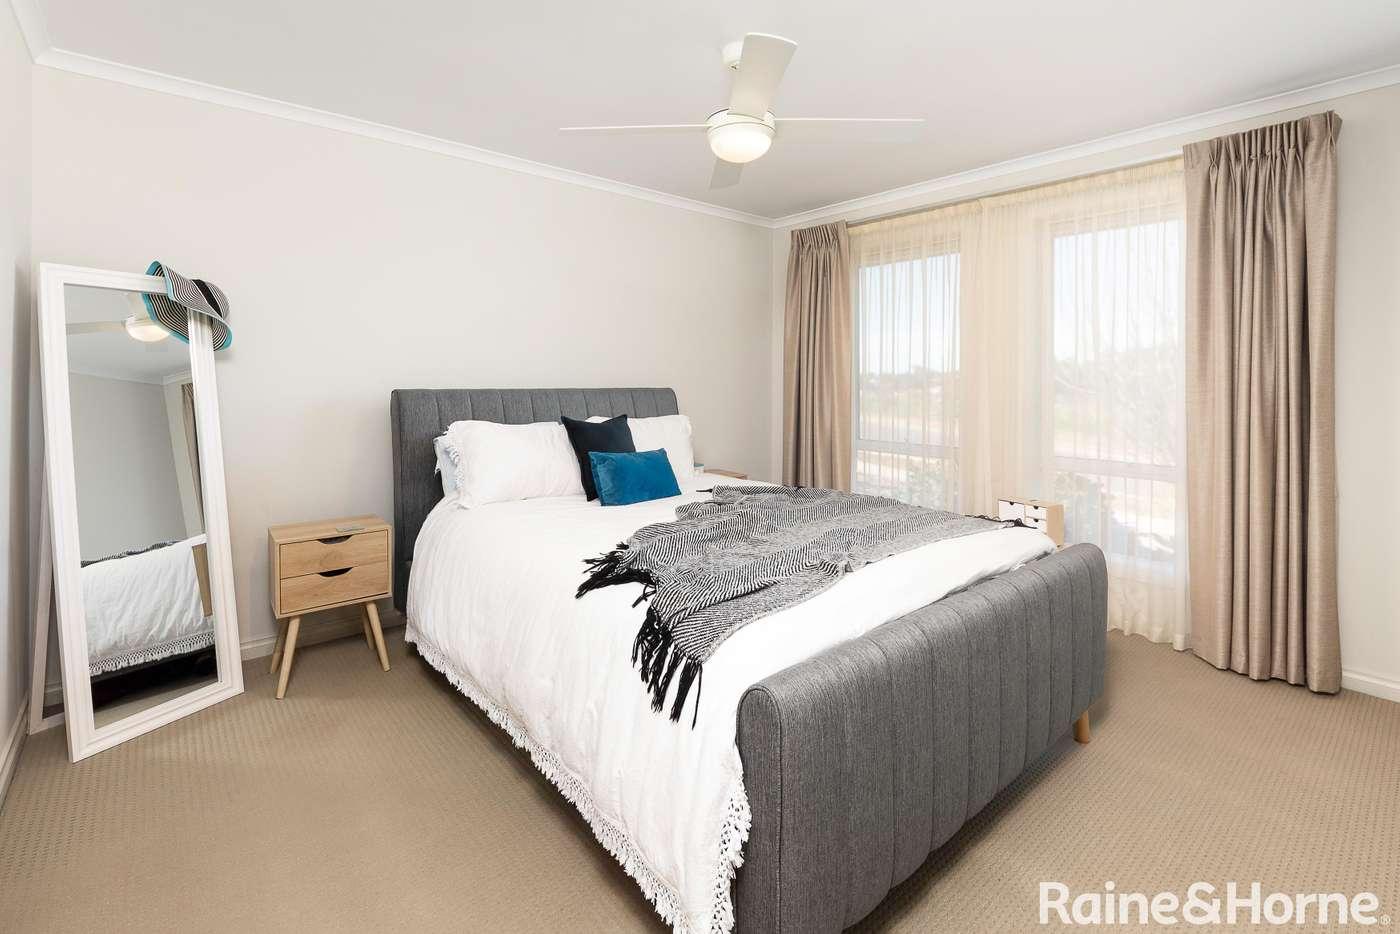 Sixth view of Homely house listing, 56 Megan Circuit, Nairne SA 5252